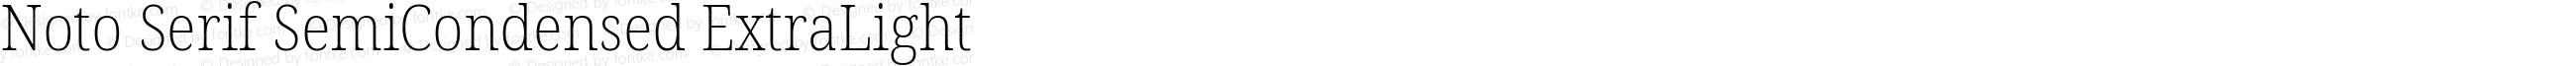 Noto Serif SemiCondensed ExtraLight